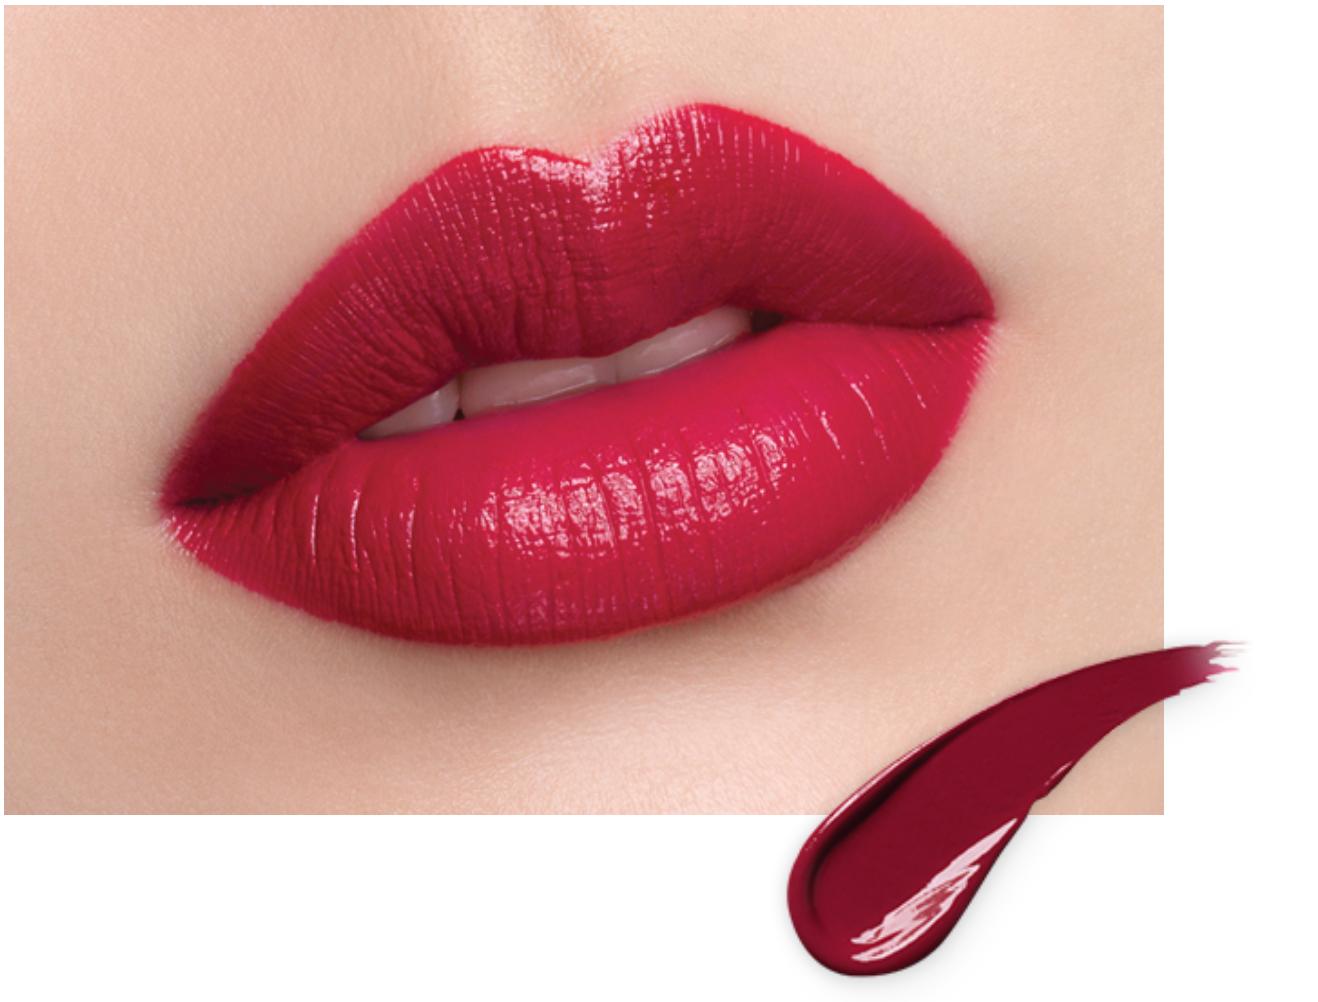 laneige-silk-intense-lipstick-345.png